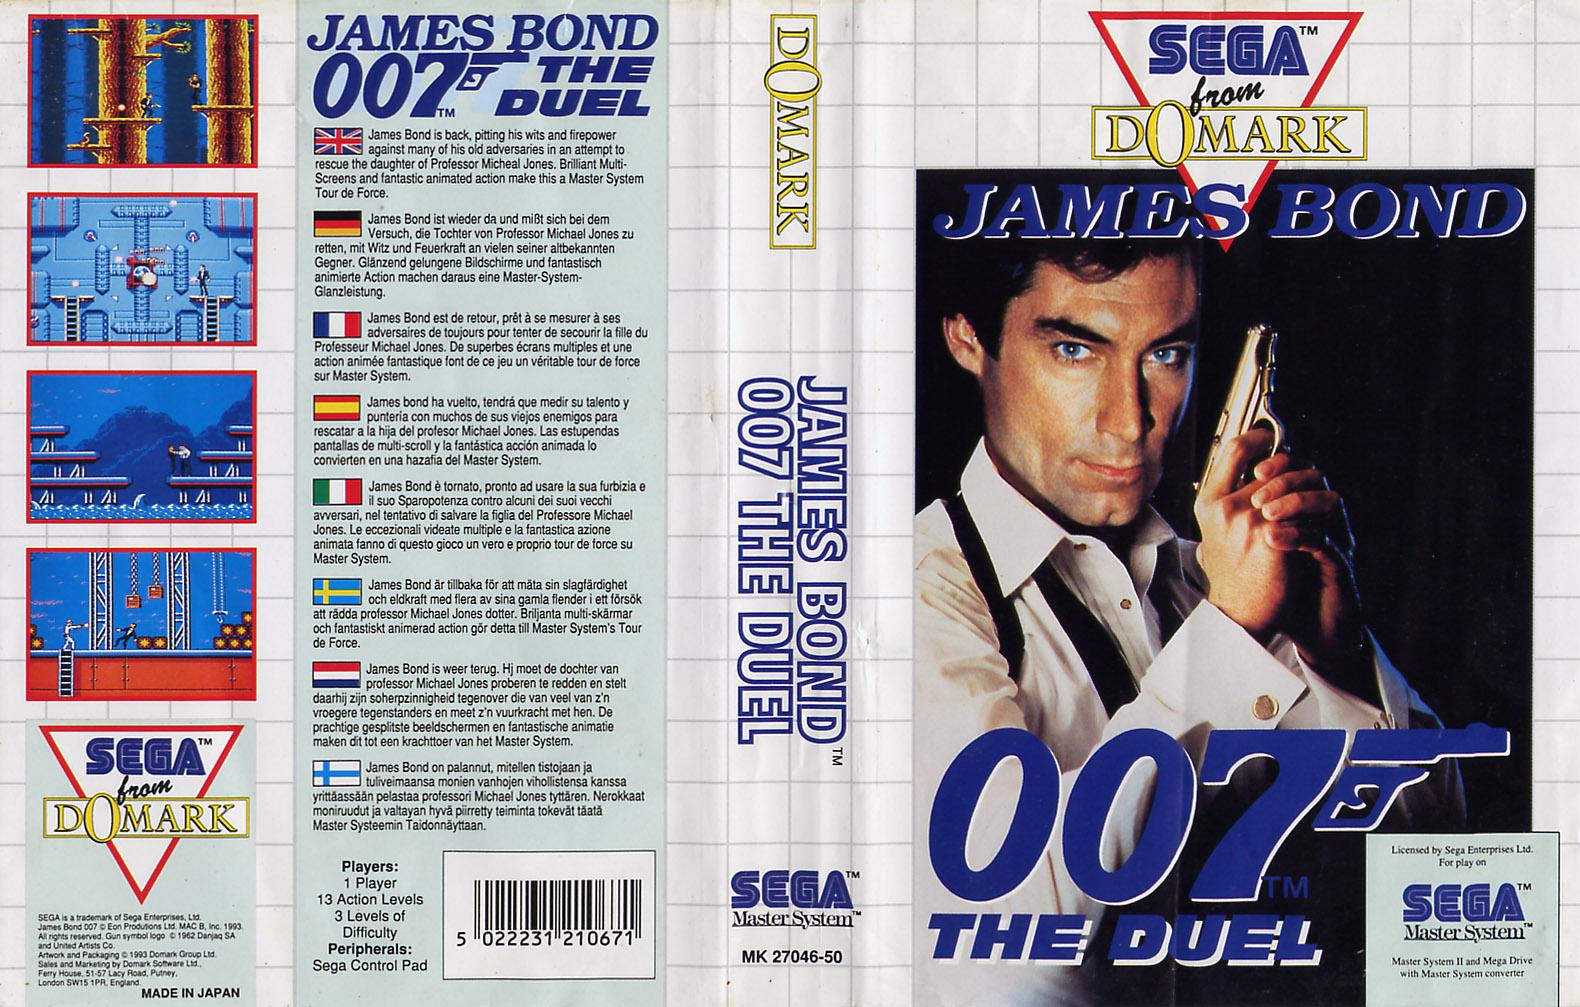 http://www.smspower.org/uploads/Scans/JamesBond007TheDuel-SMS-EU.jpg